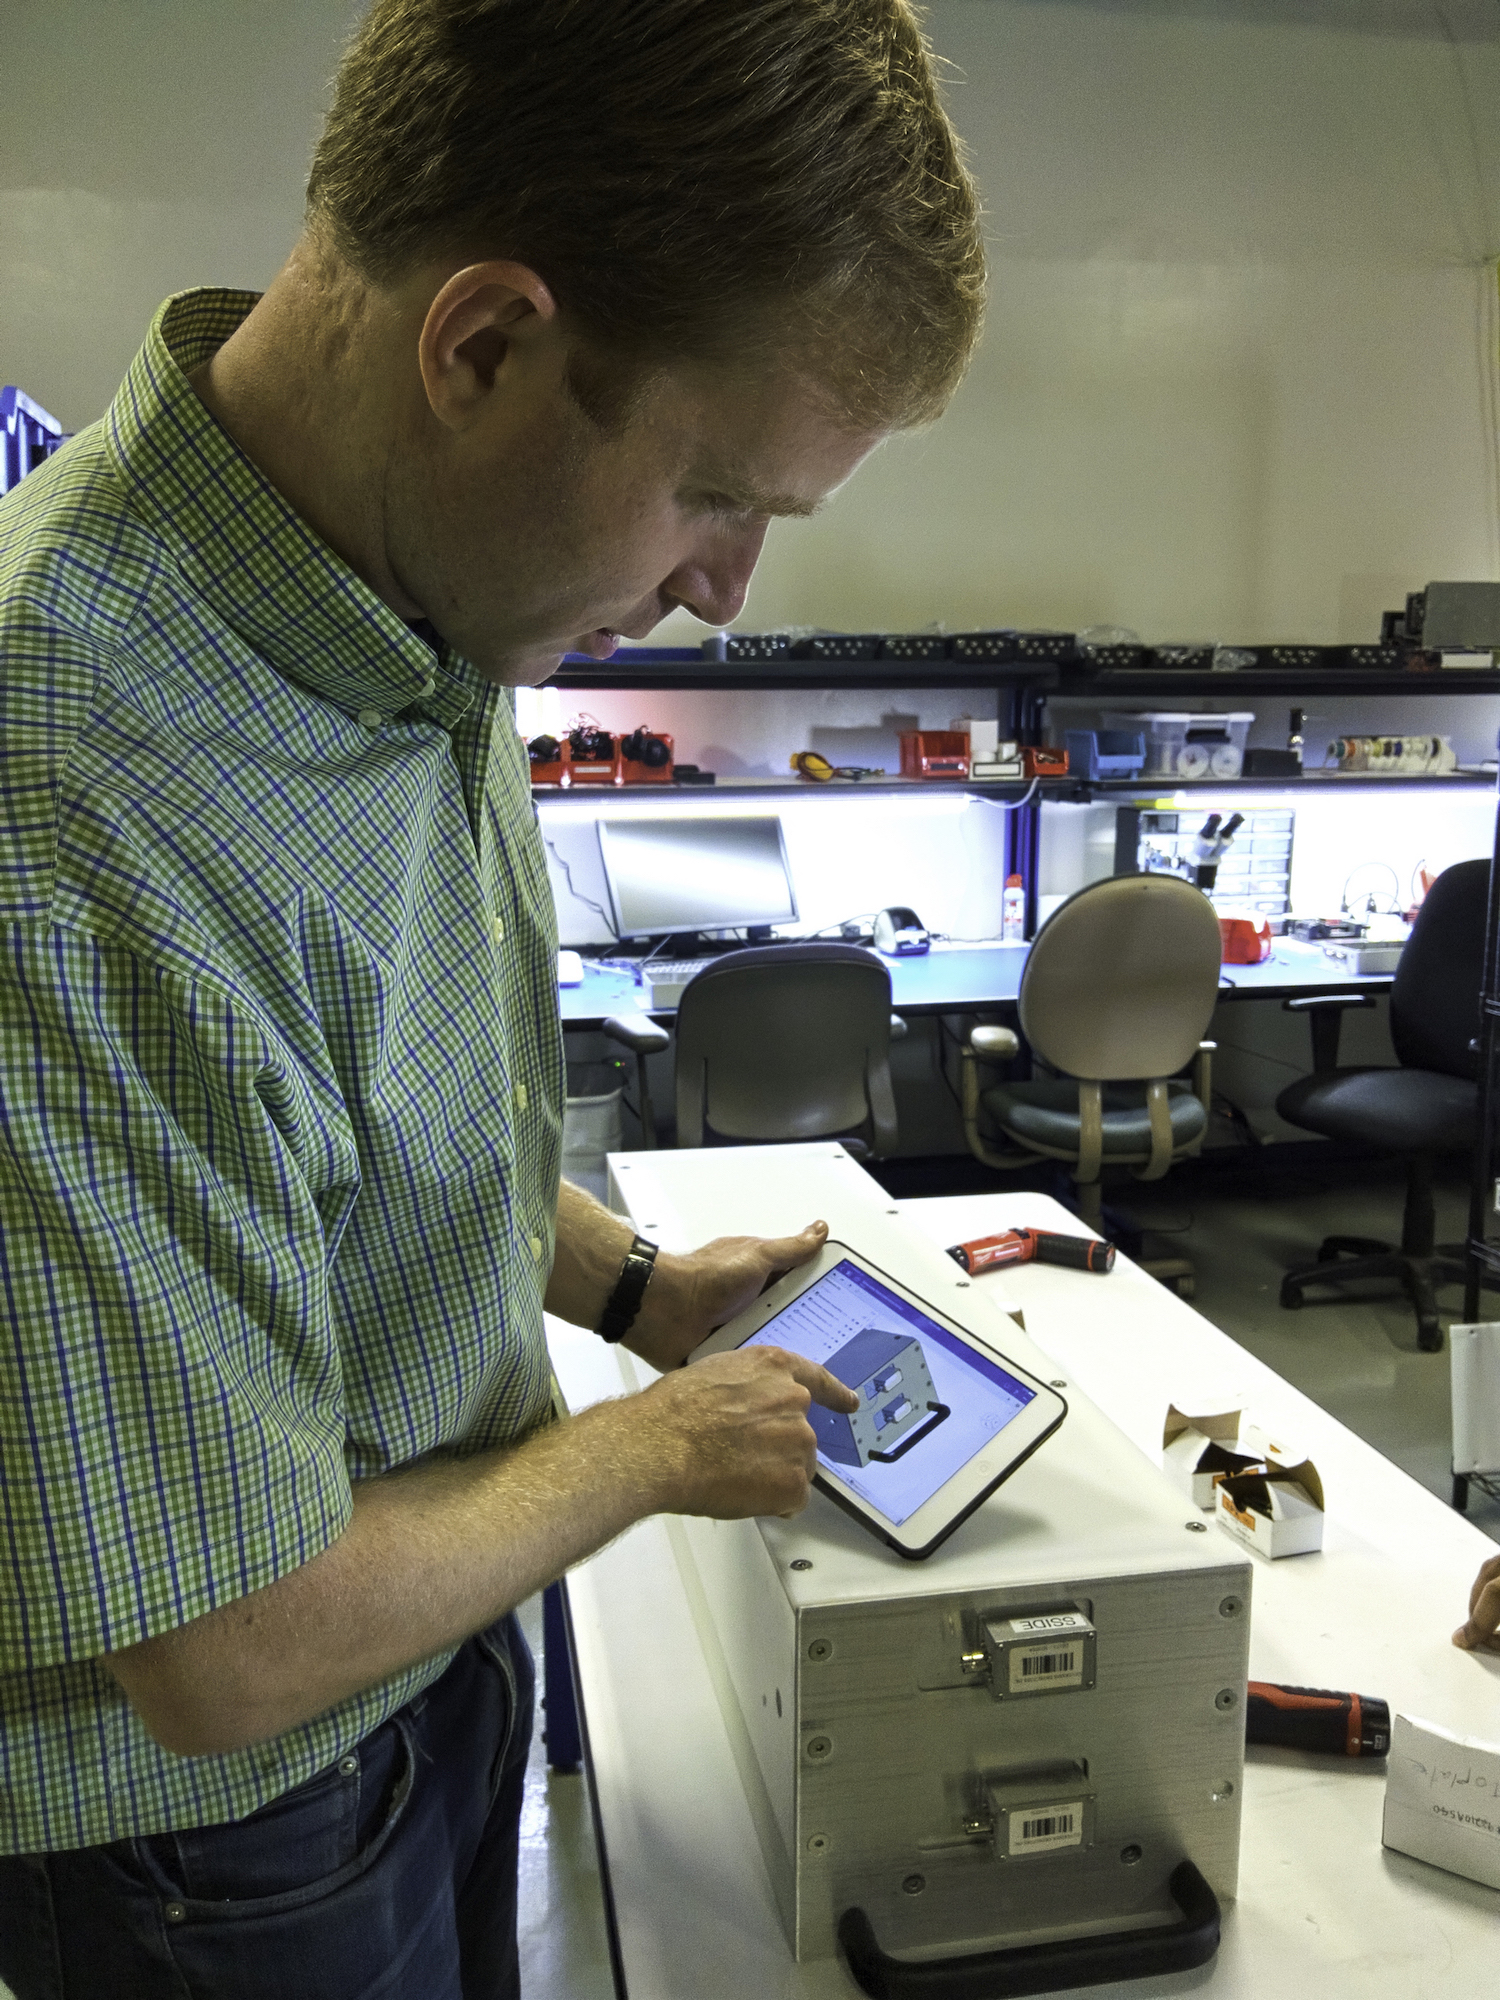 Philip Taber designing the nuclear radiation detector in Onshape. Image via Silverside Detectors